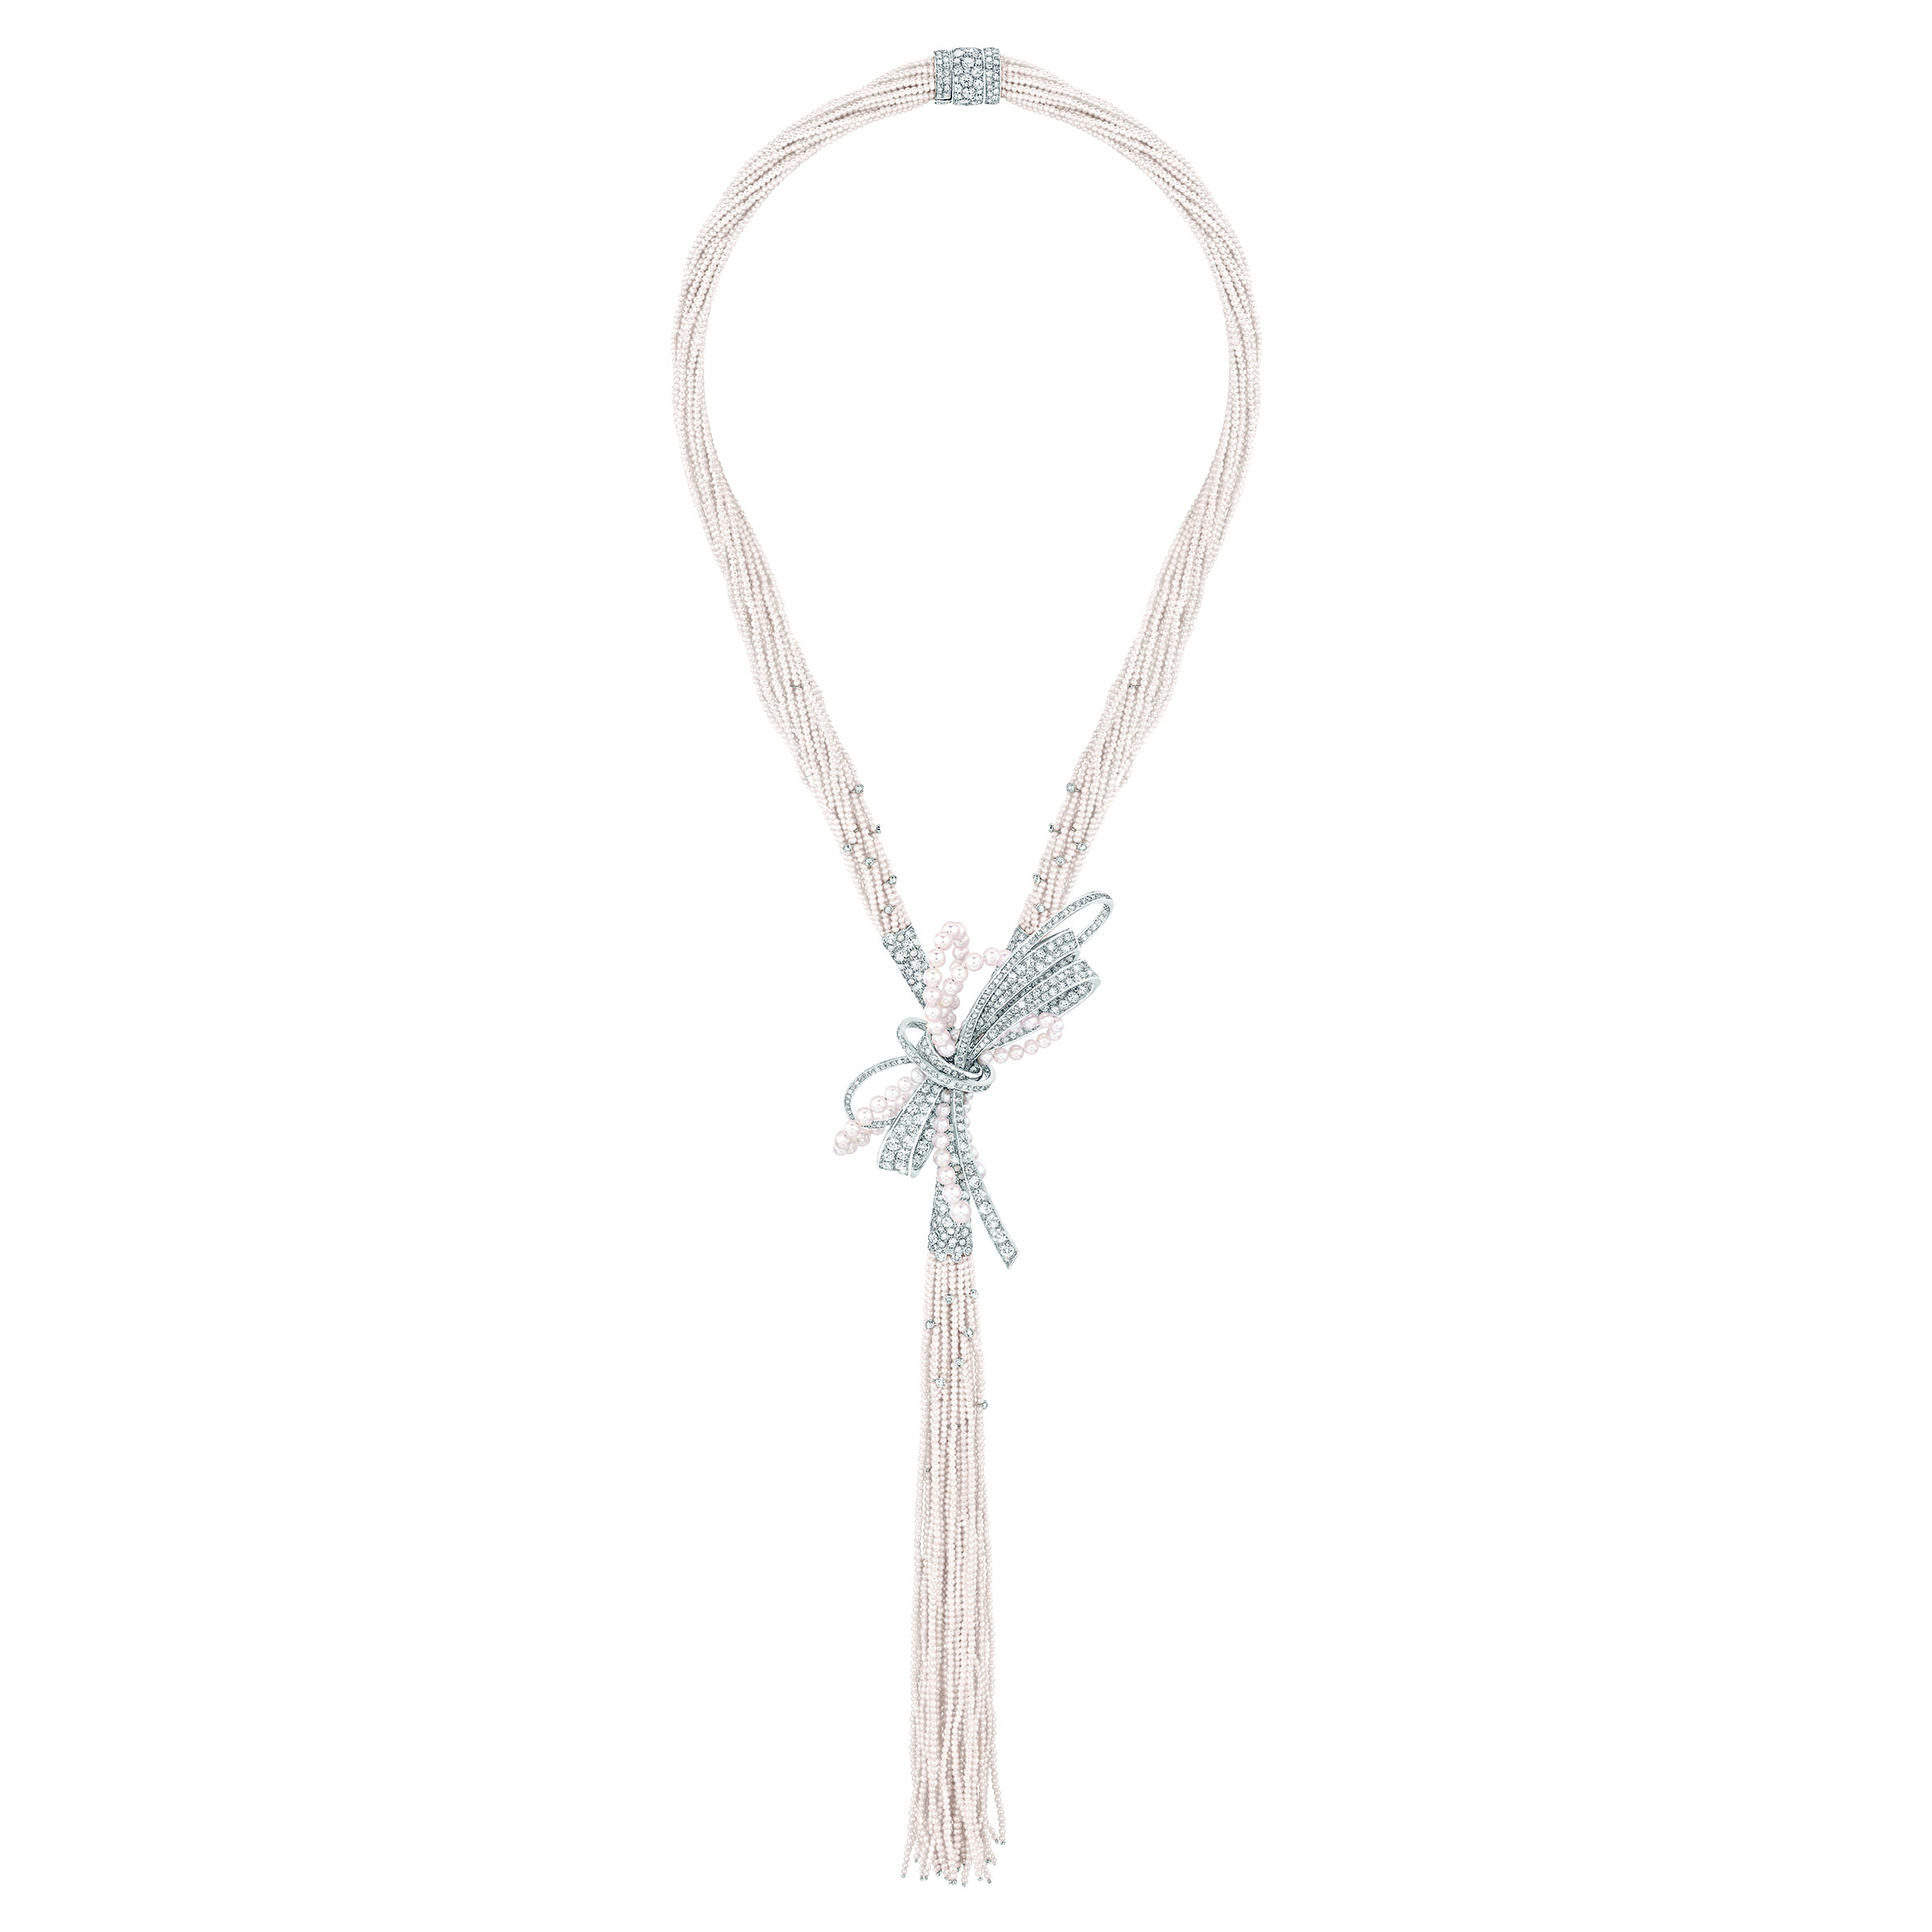 Collier Perles De Couture Luxsure